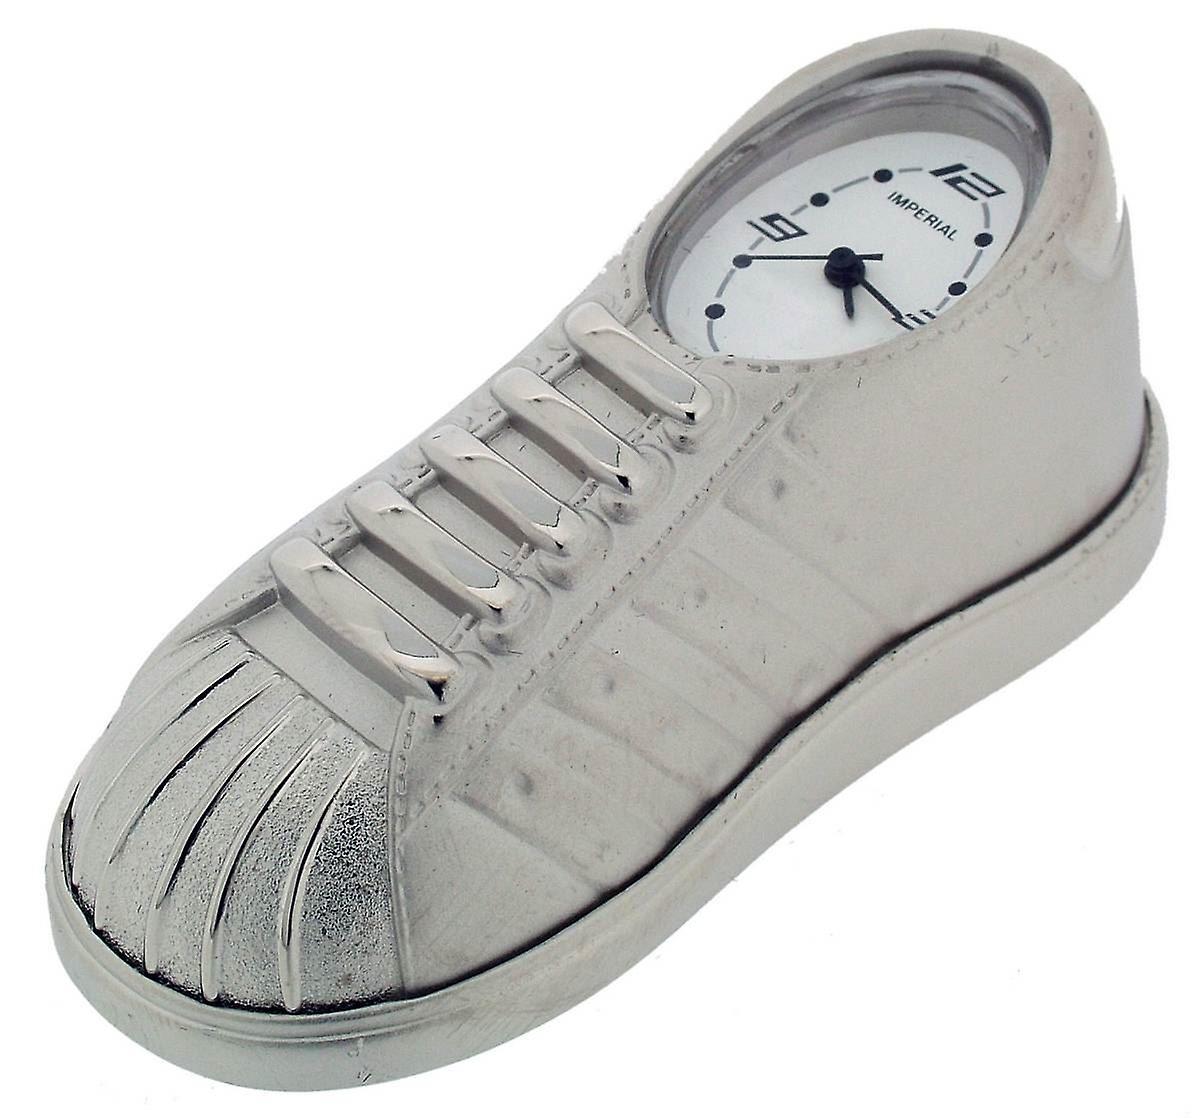 Trainer Time Shoe ClockSilver Gift Products Mini FJTlKu1c3